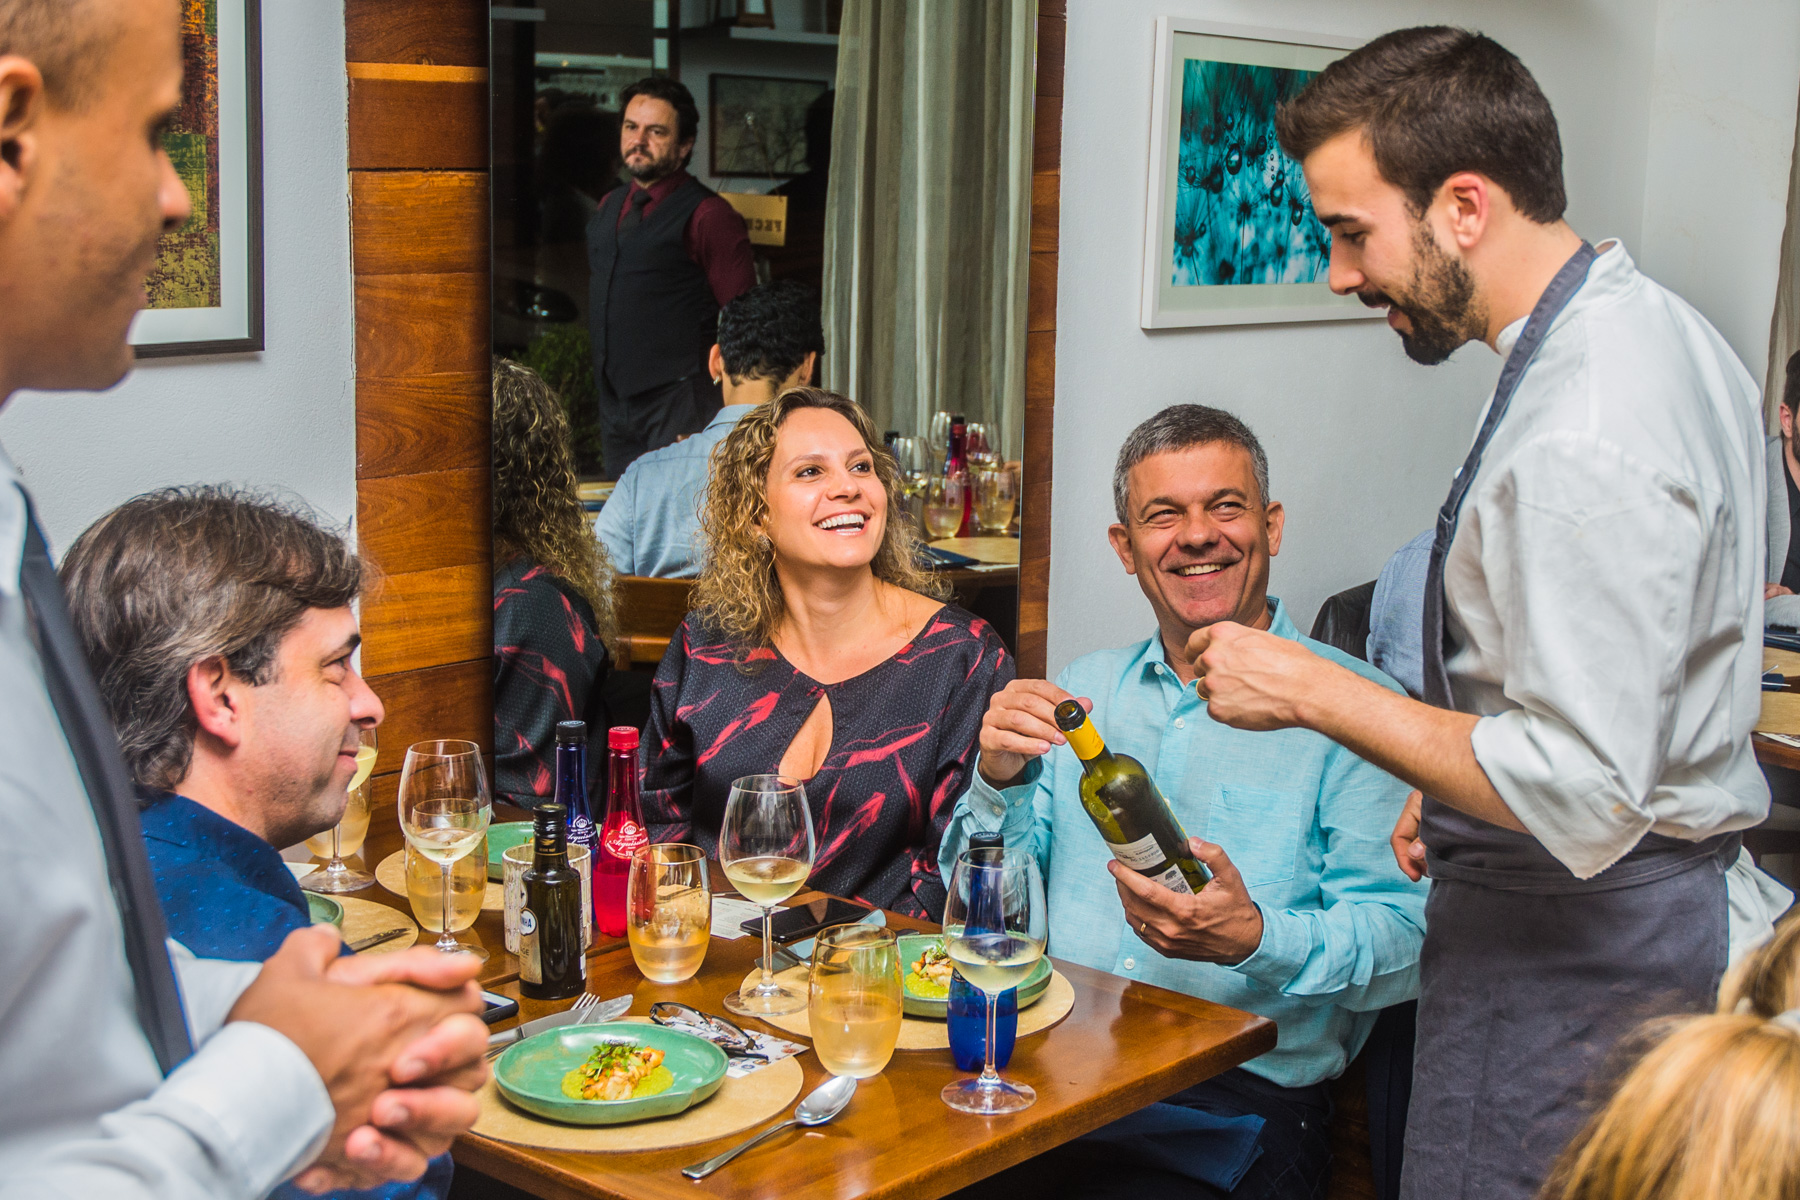 prove_portugal-7-RiosRestaurante.jpg